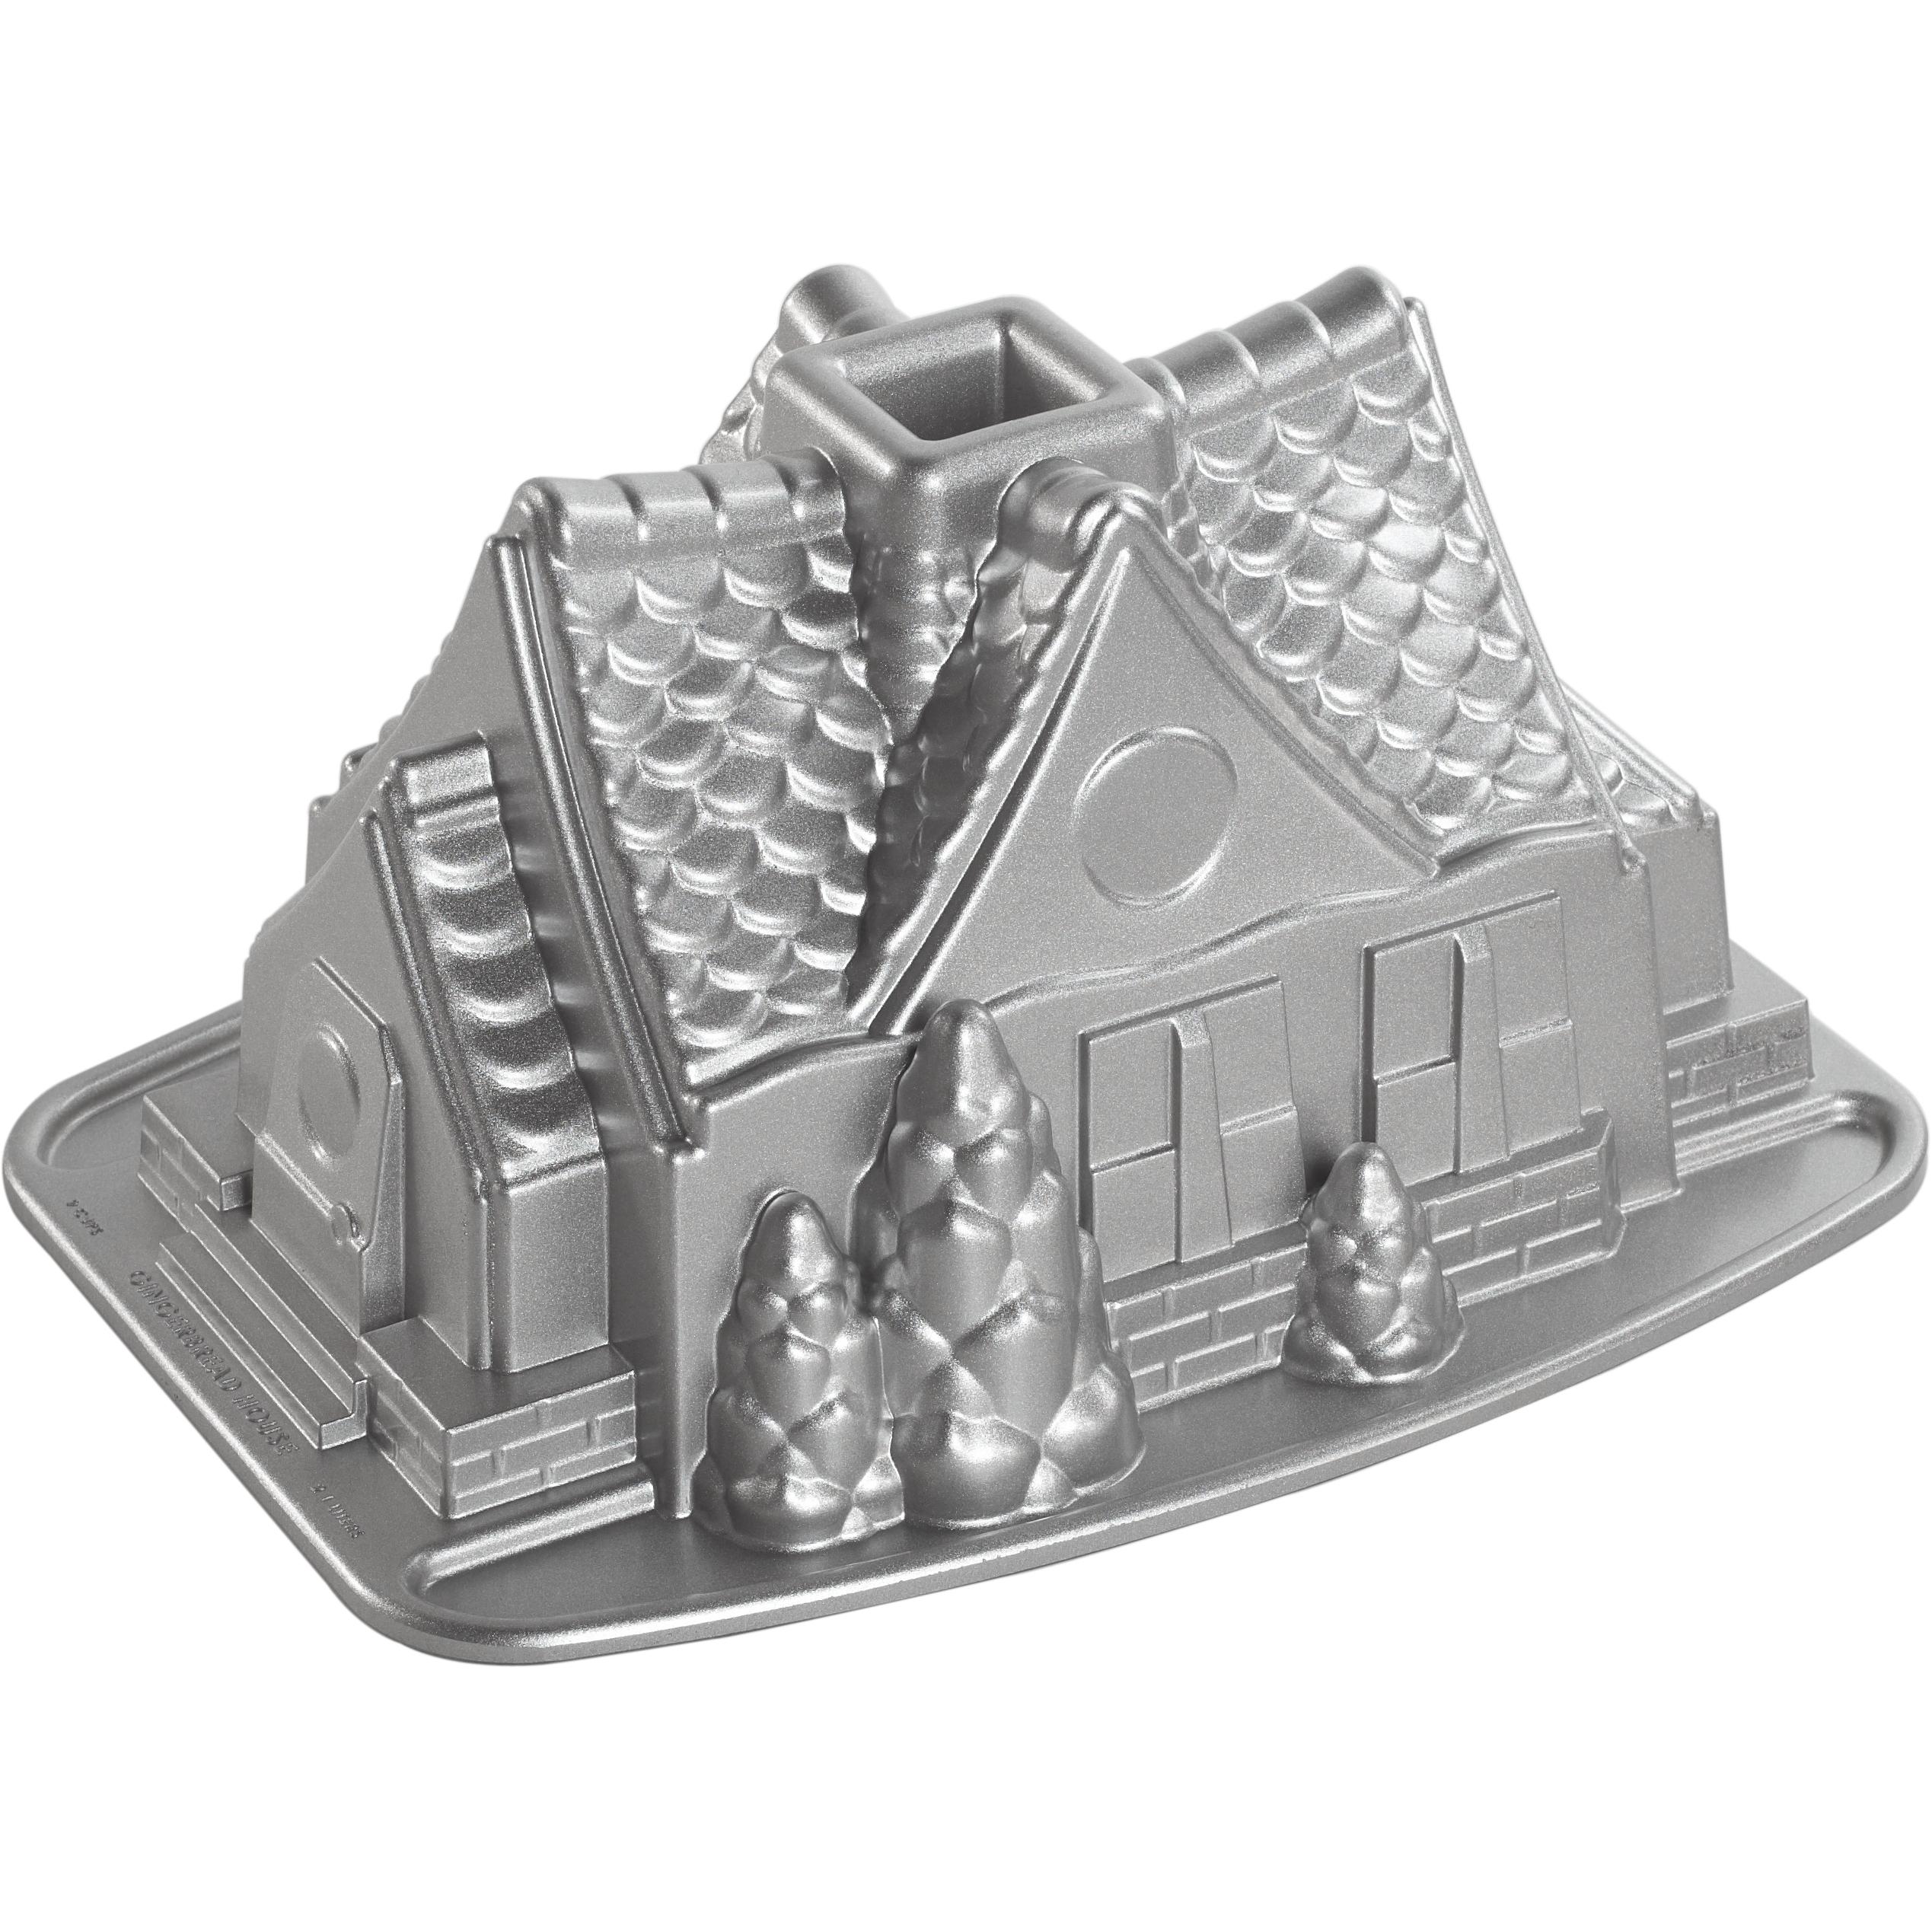 Nordic Ware Platinum Bakeware Gingerbread House Bundt Cake Pan